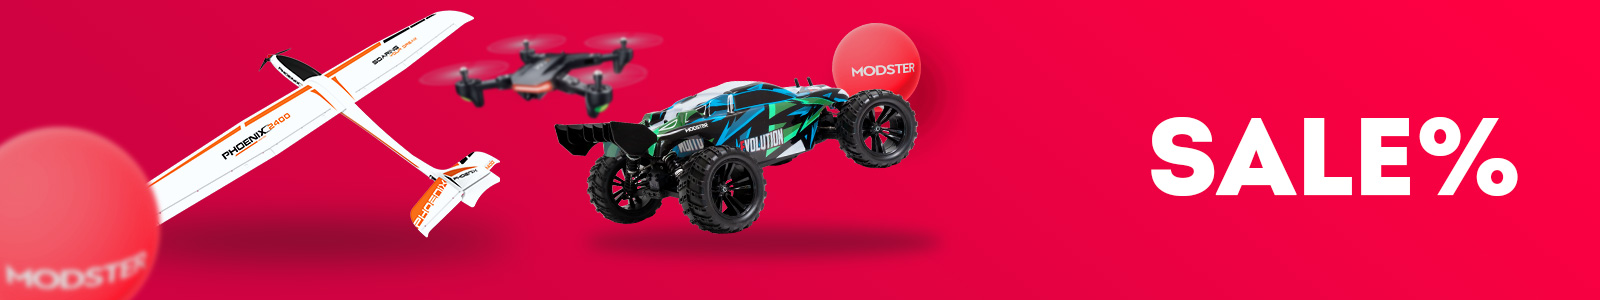 Modster-Sale-Rabatt-RC-Modellbau-Modellsport-Ferngesteuert